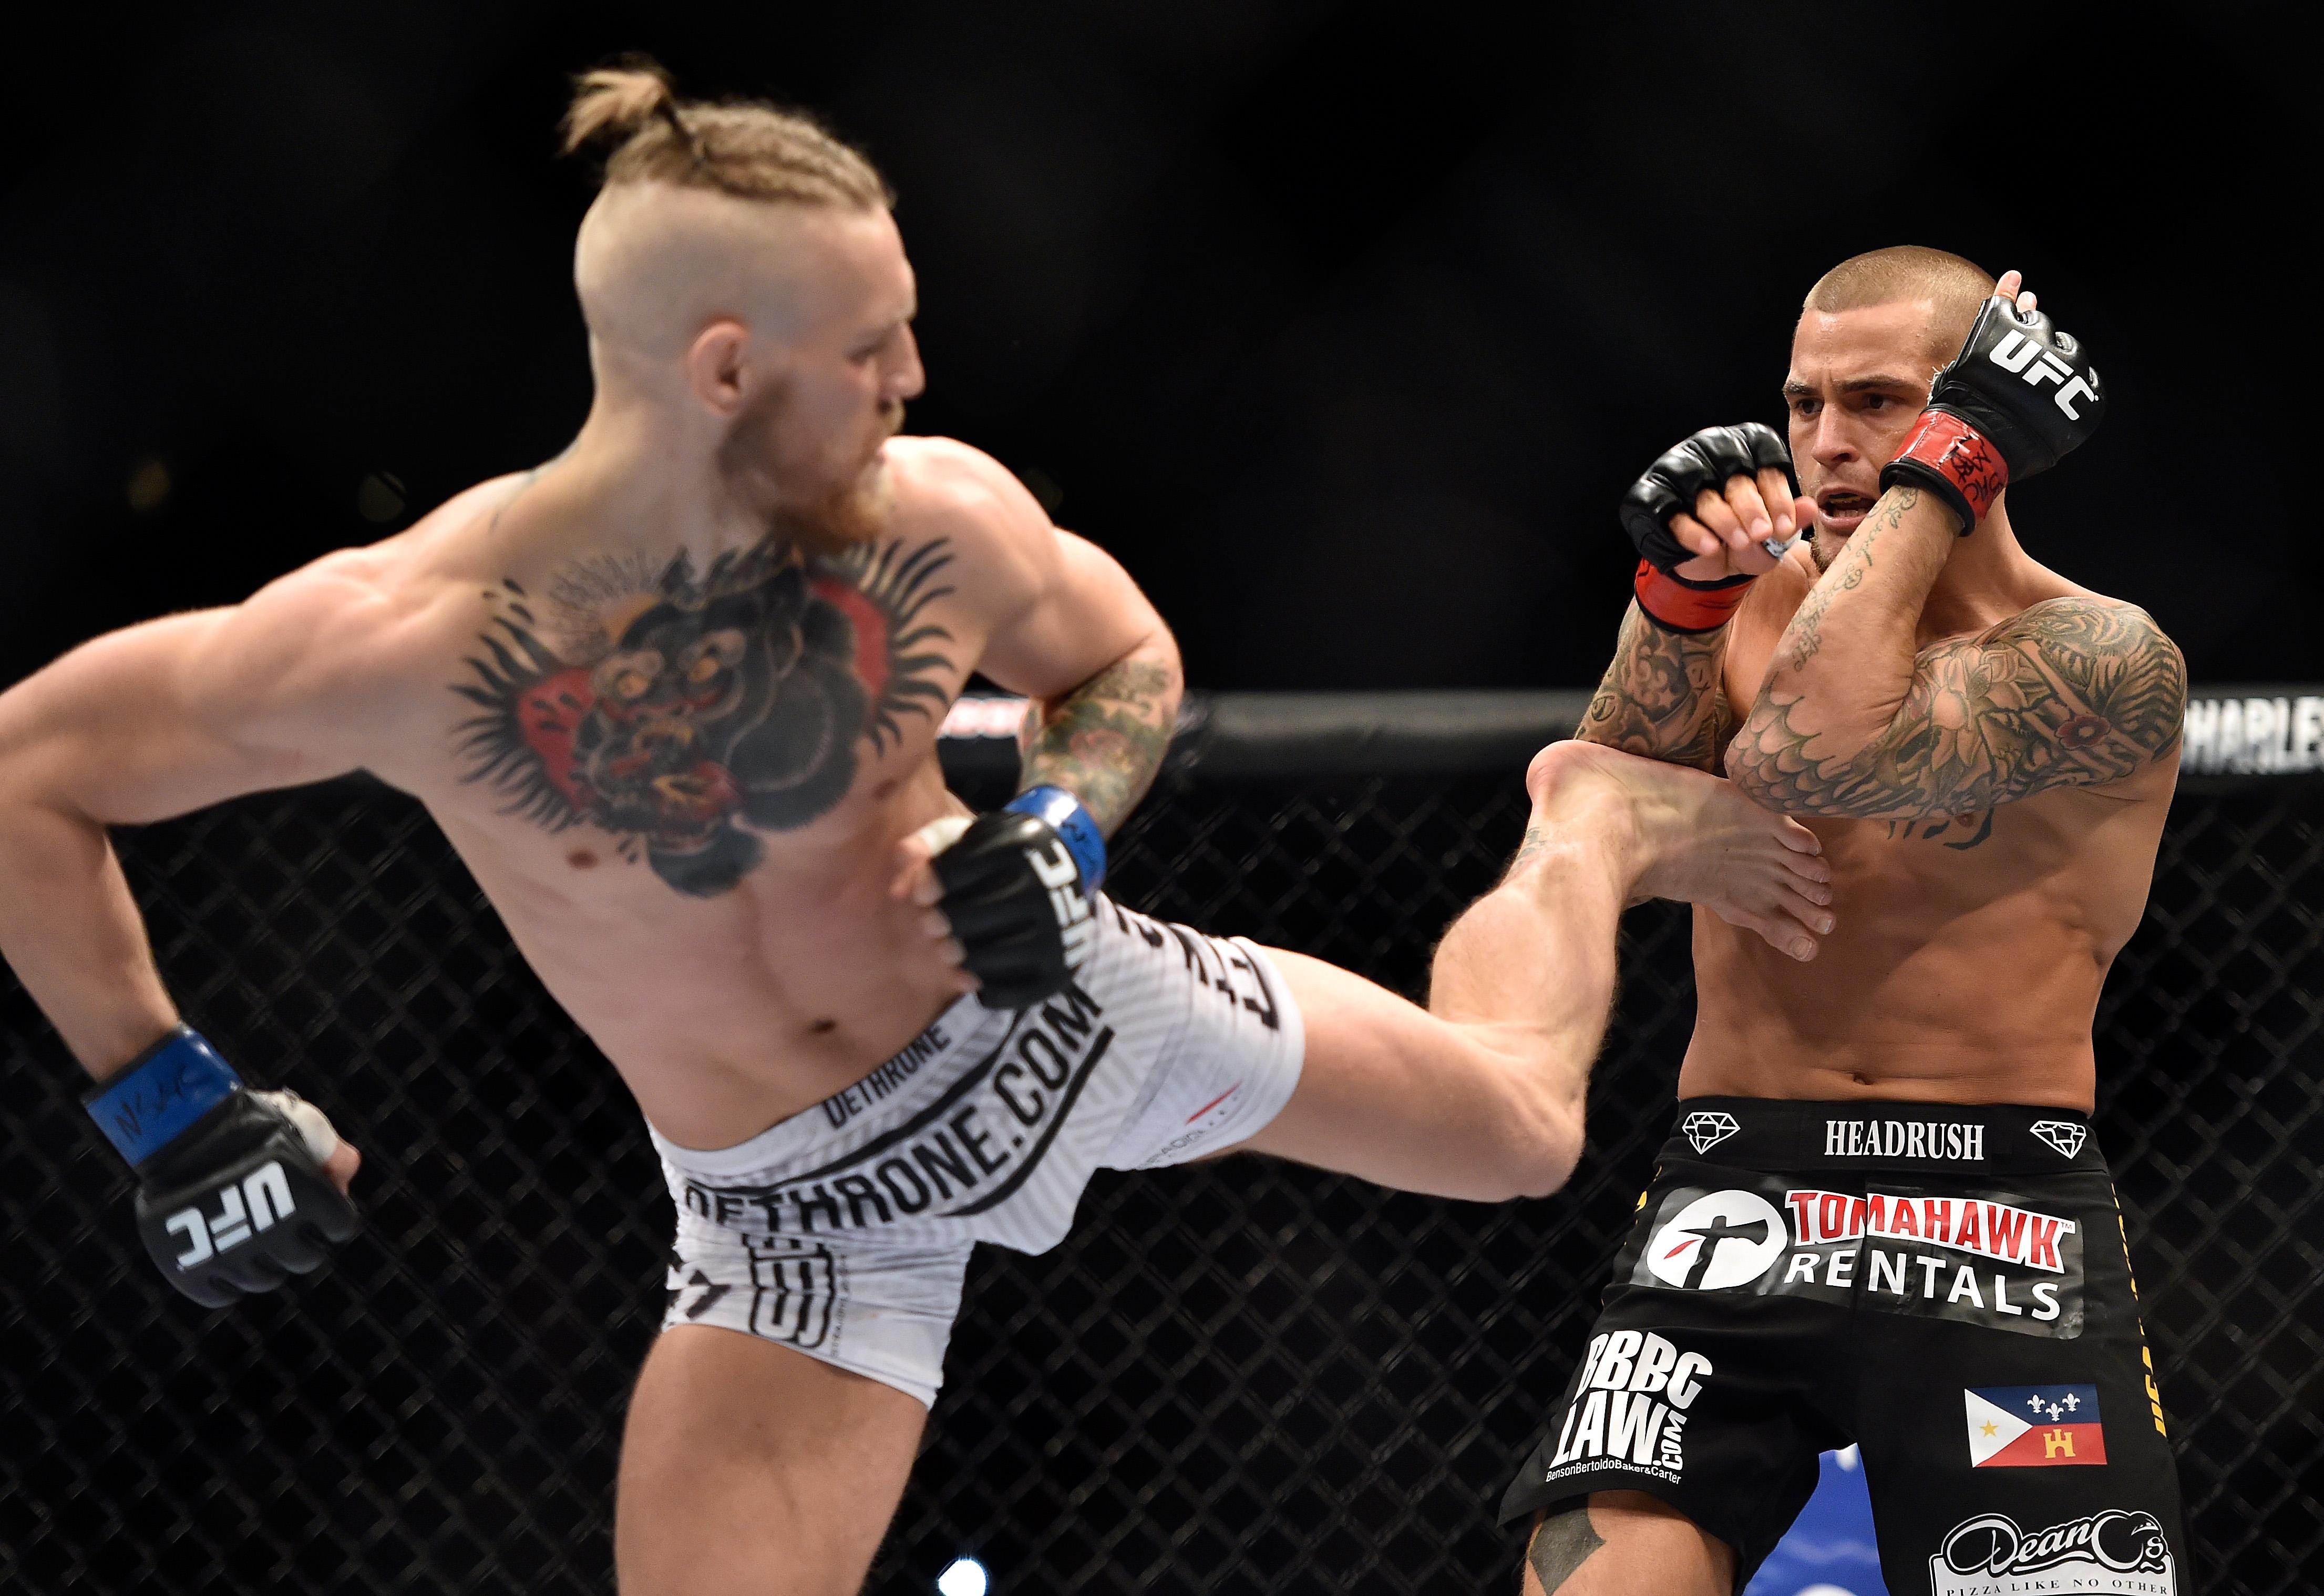 UFC 178 - Dustin Poirier v Conor McGregor